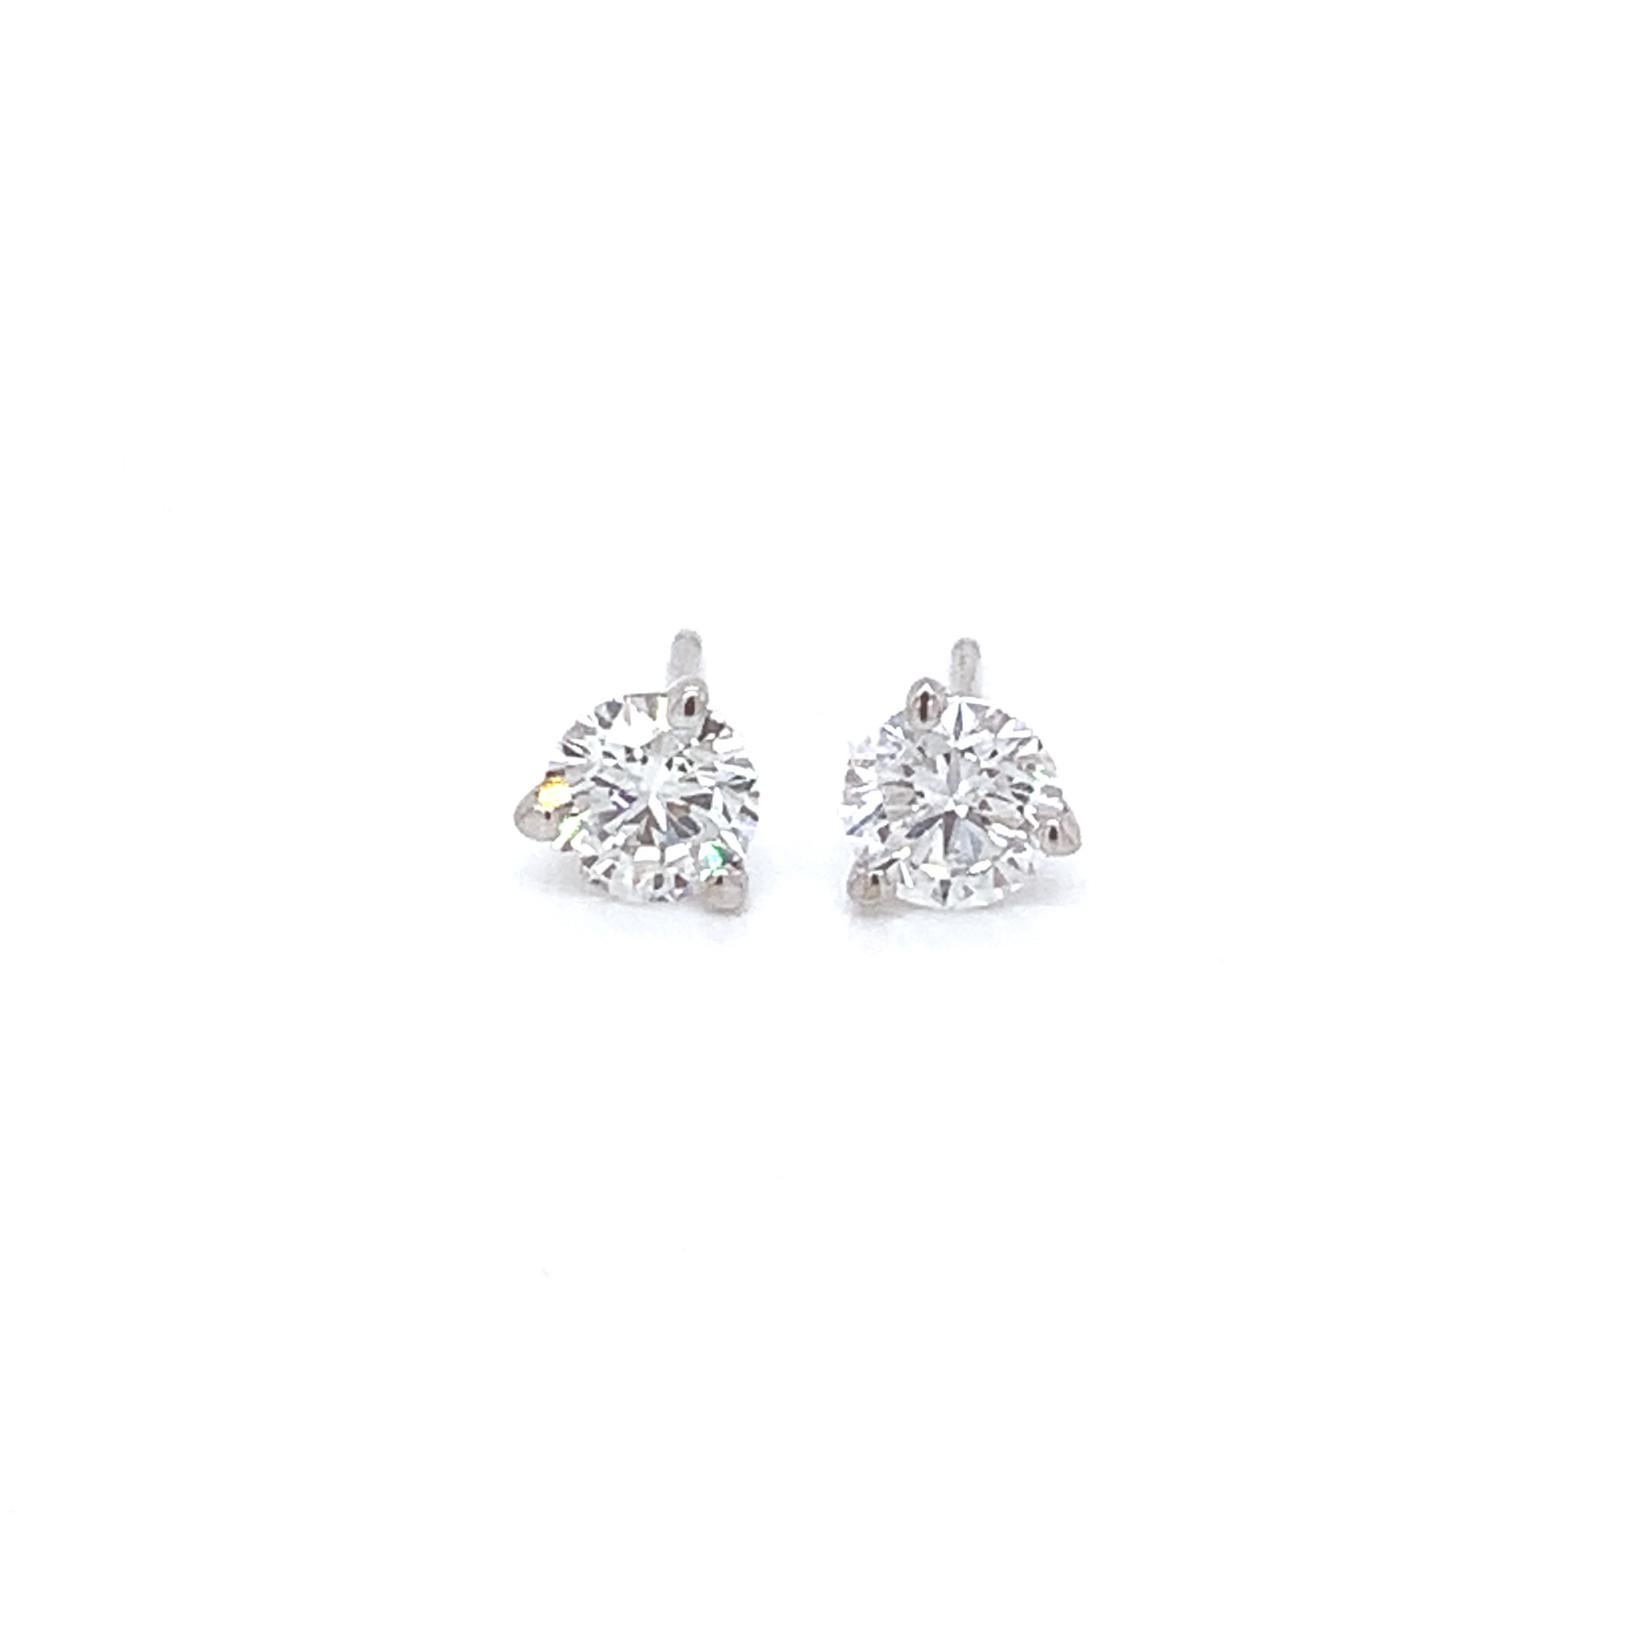 On The Edge Lab Diamond Earrings - 1.00 ctw